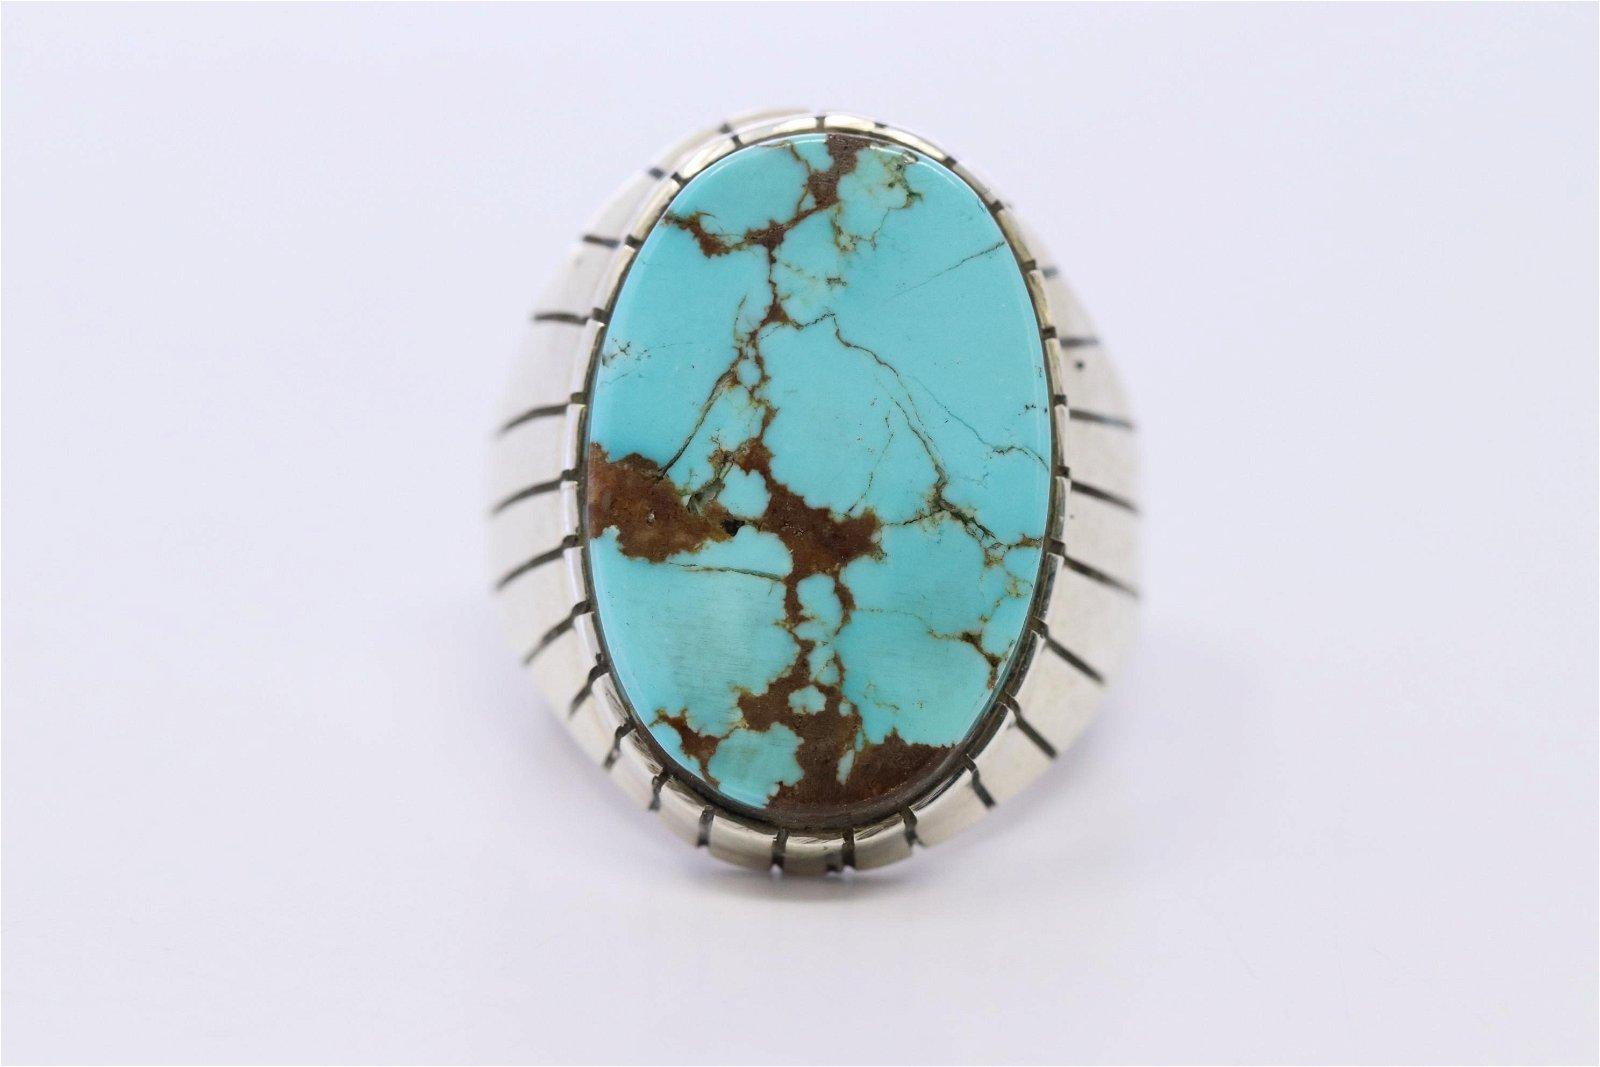 Native American Navajo Handmade Ring By Ray Jack.